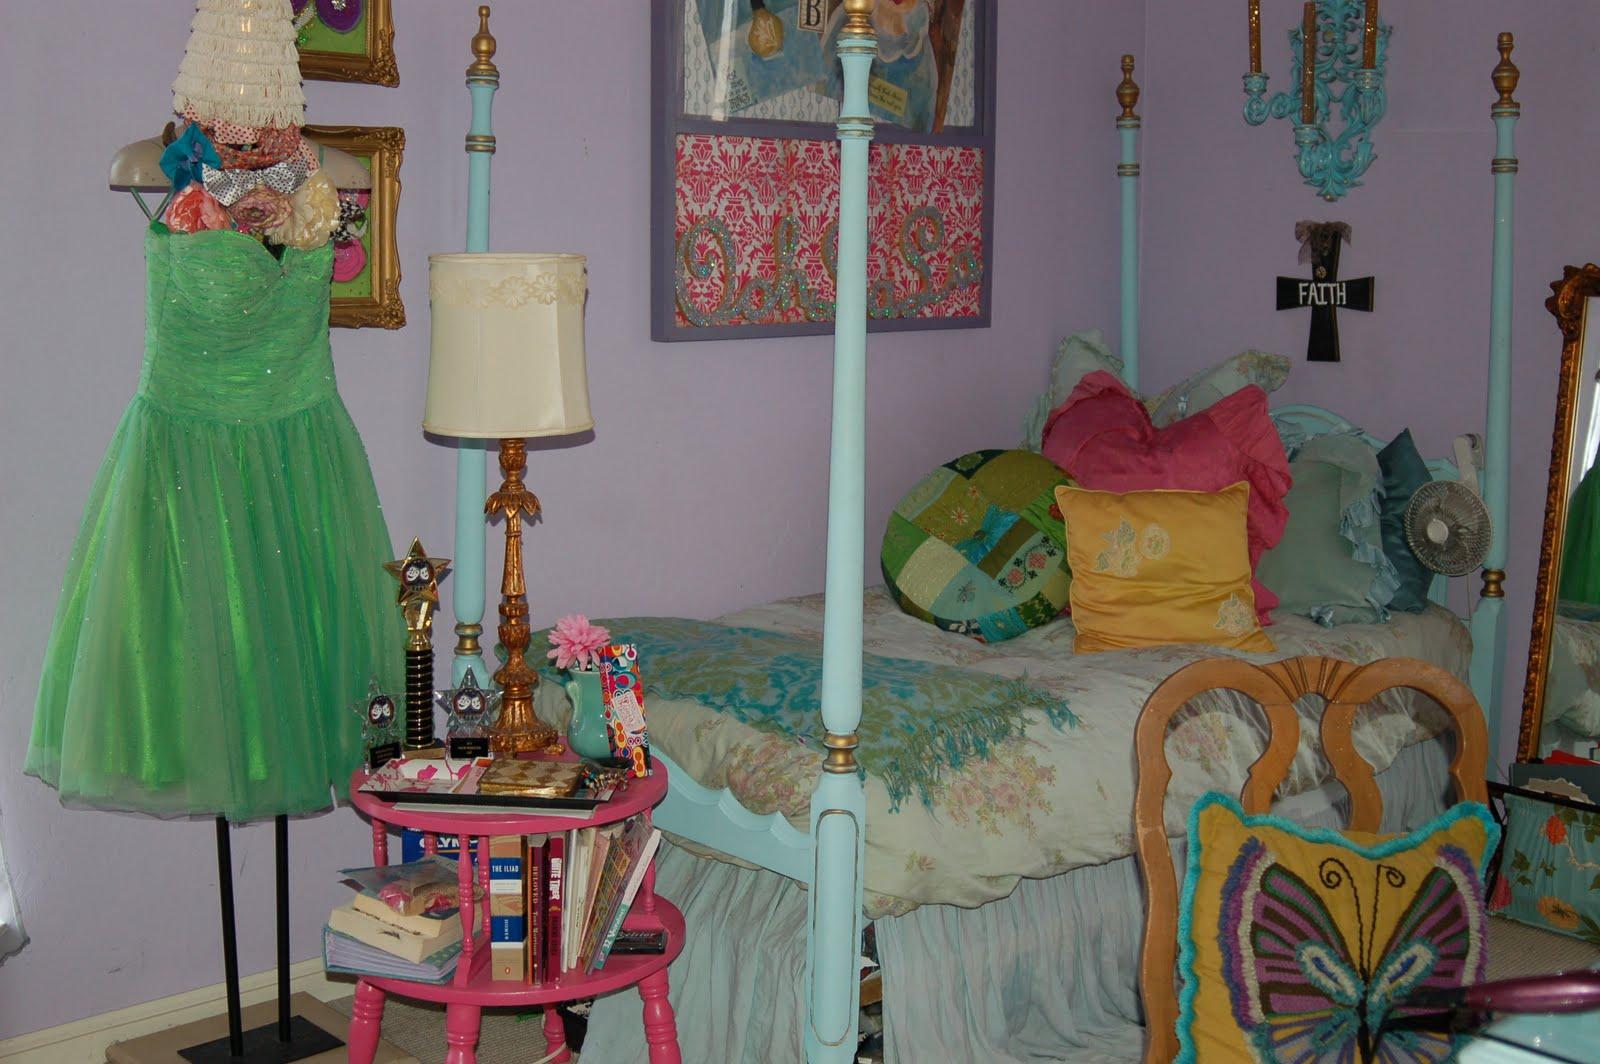 Adorable BoHo Shabby Chic Bedroom | Beyond the Screen Door